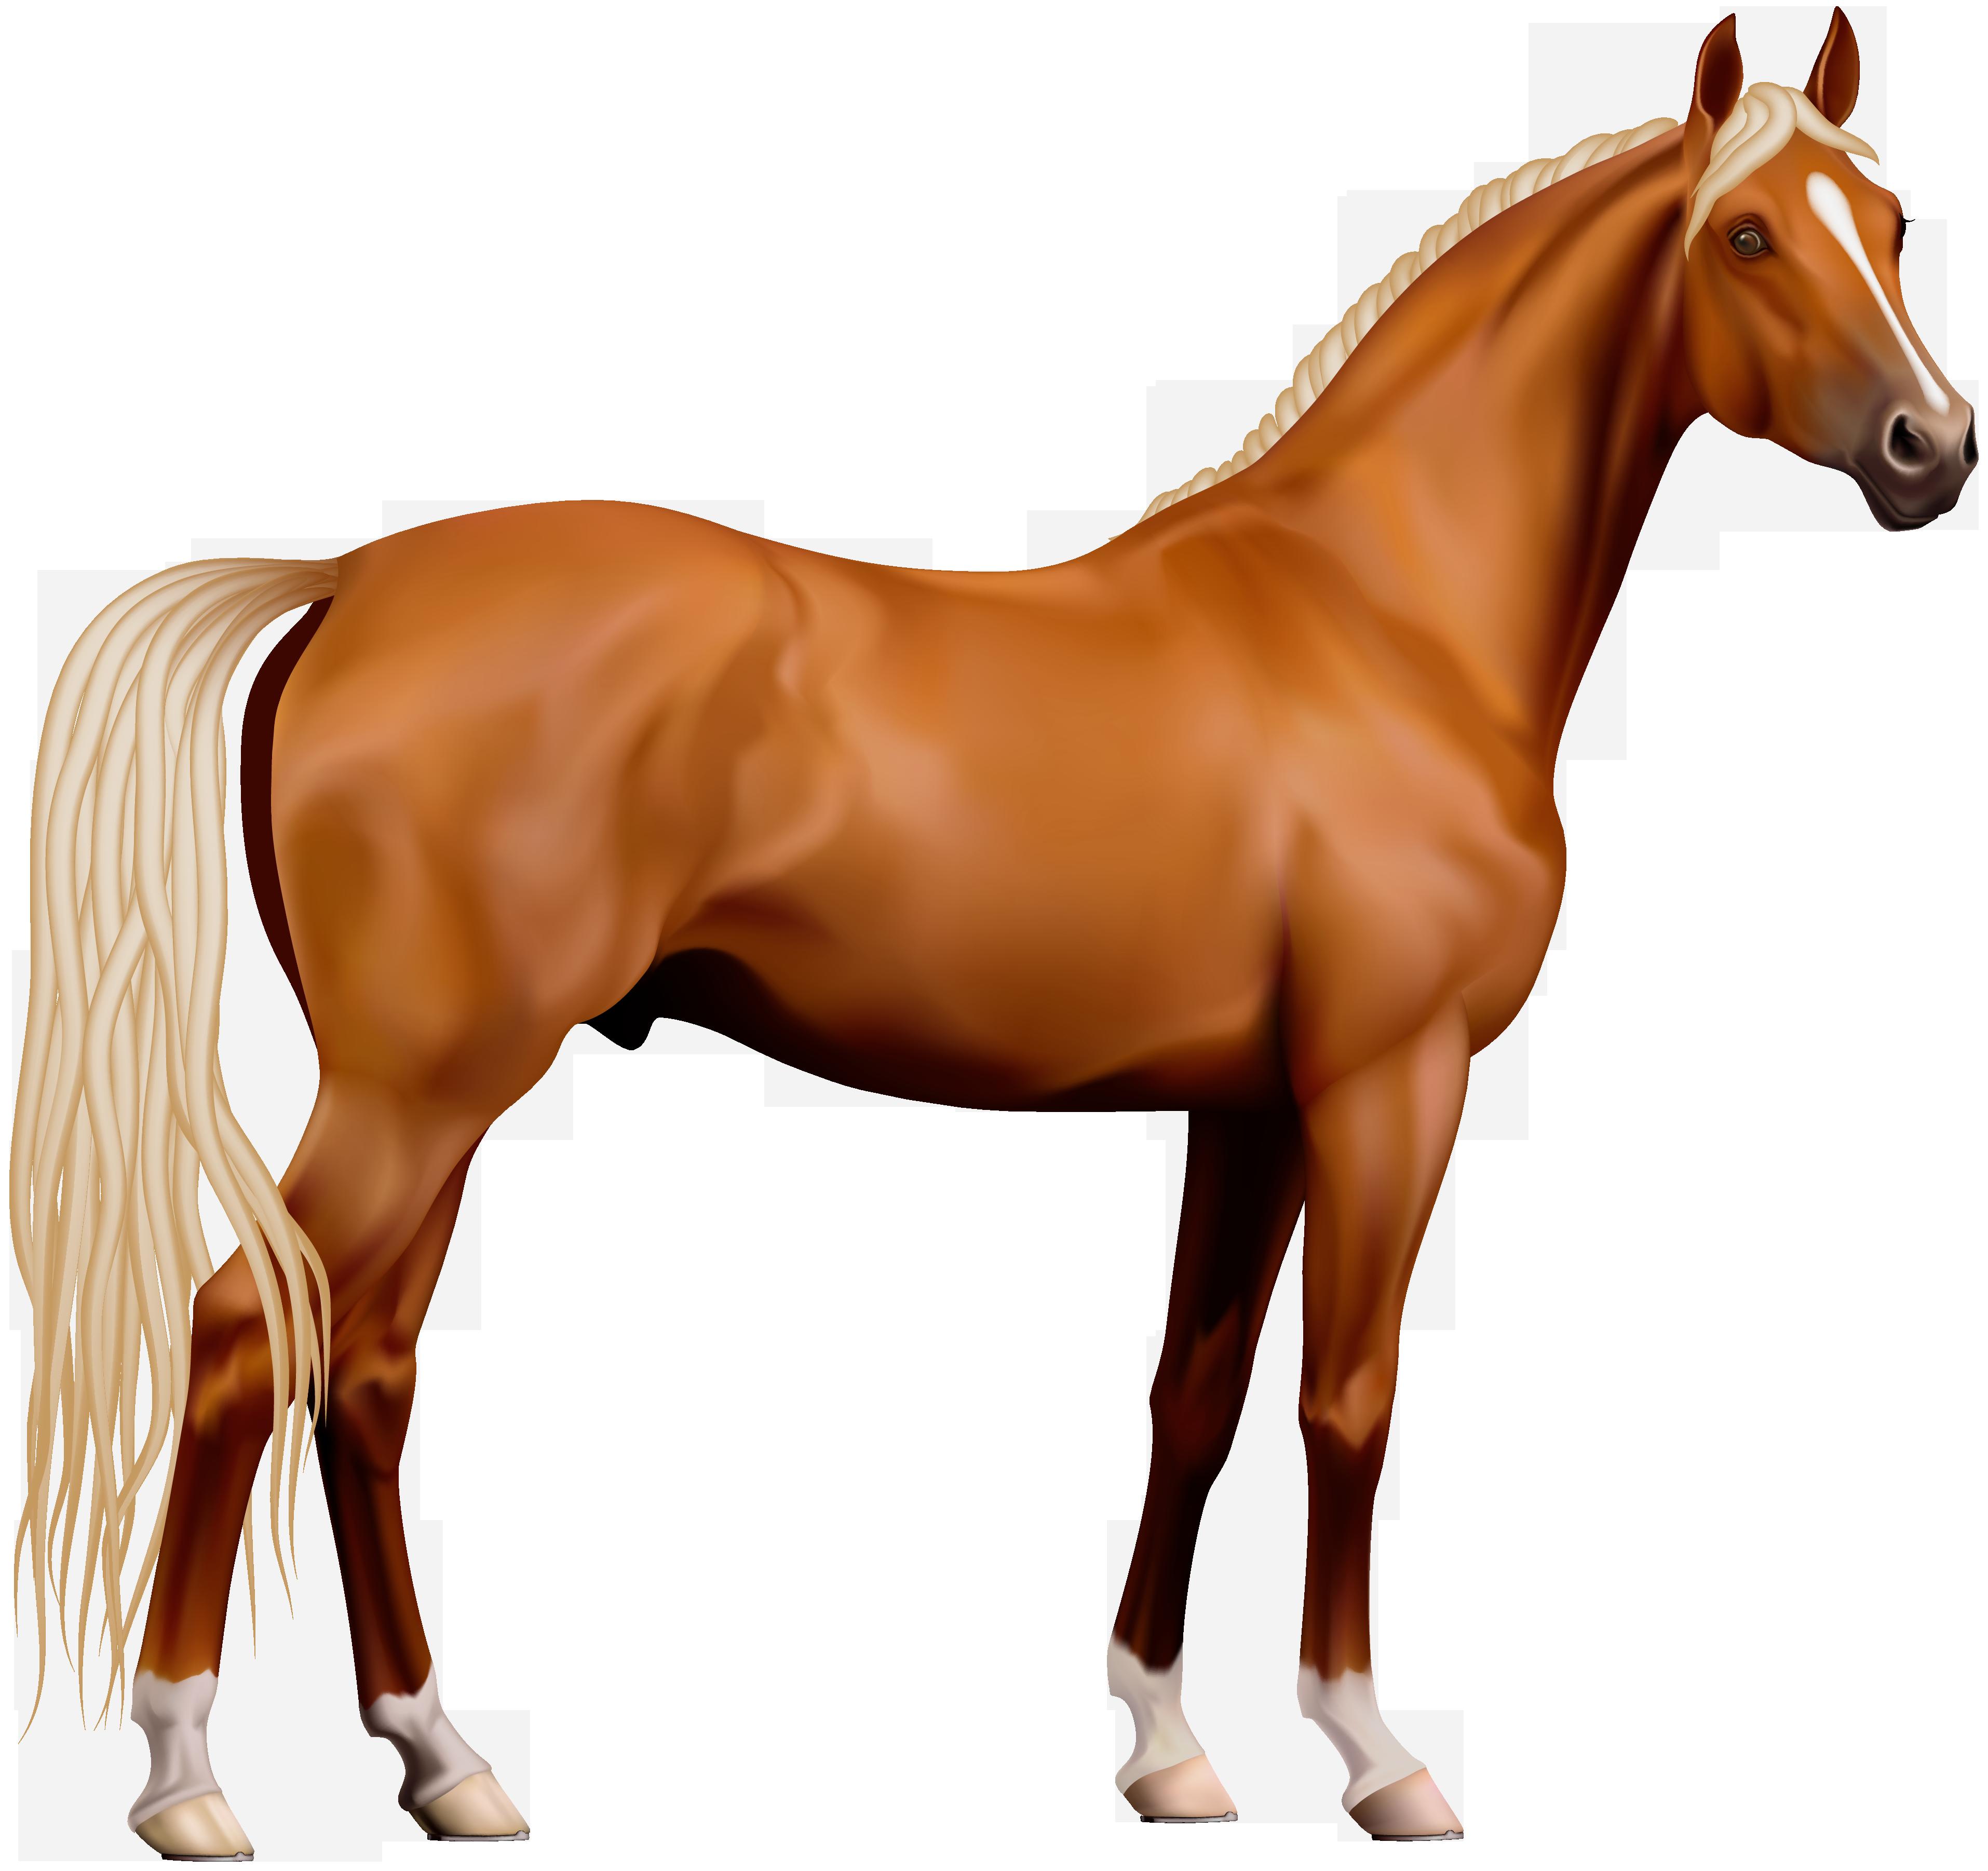 Transparent Horse Png Clipart - Horse, Transparent background PNG HD thumbnail